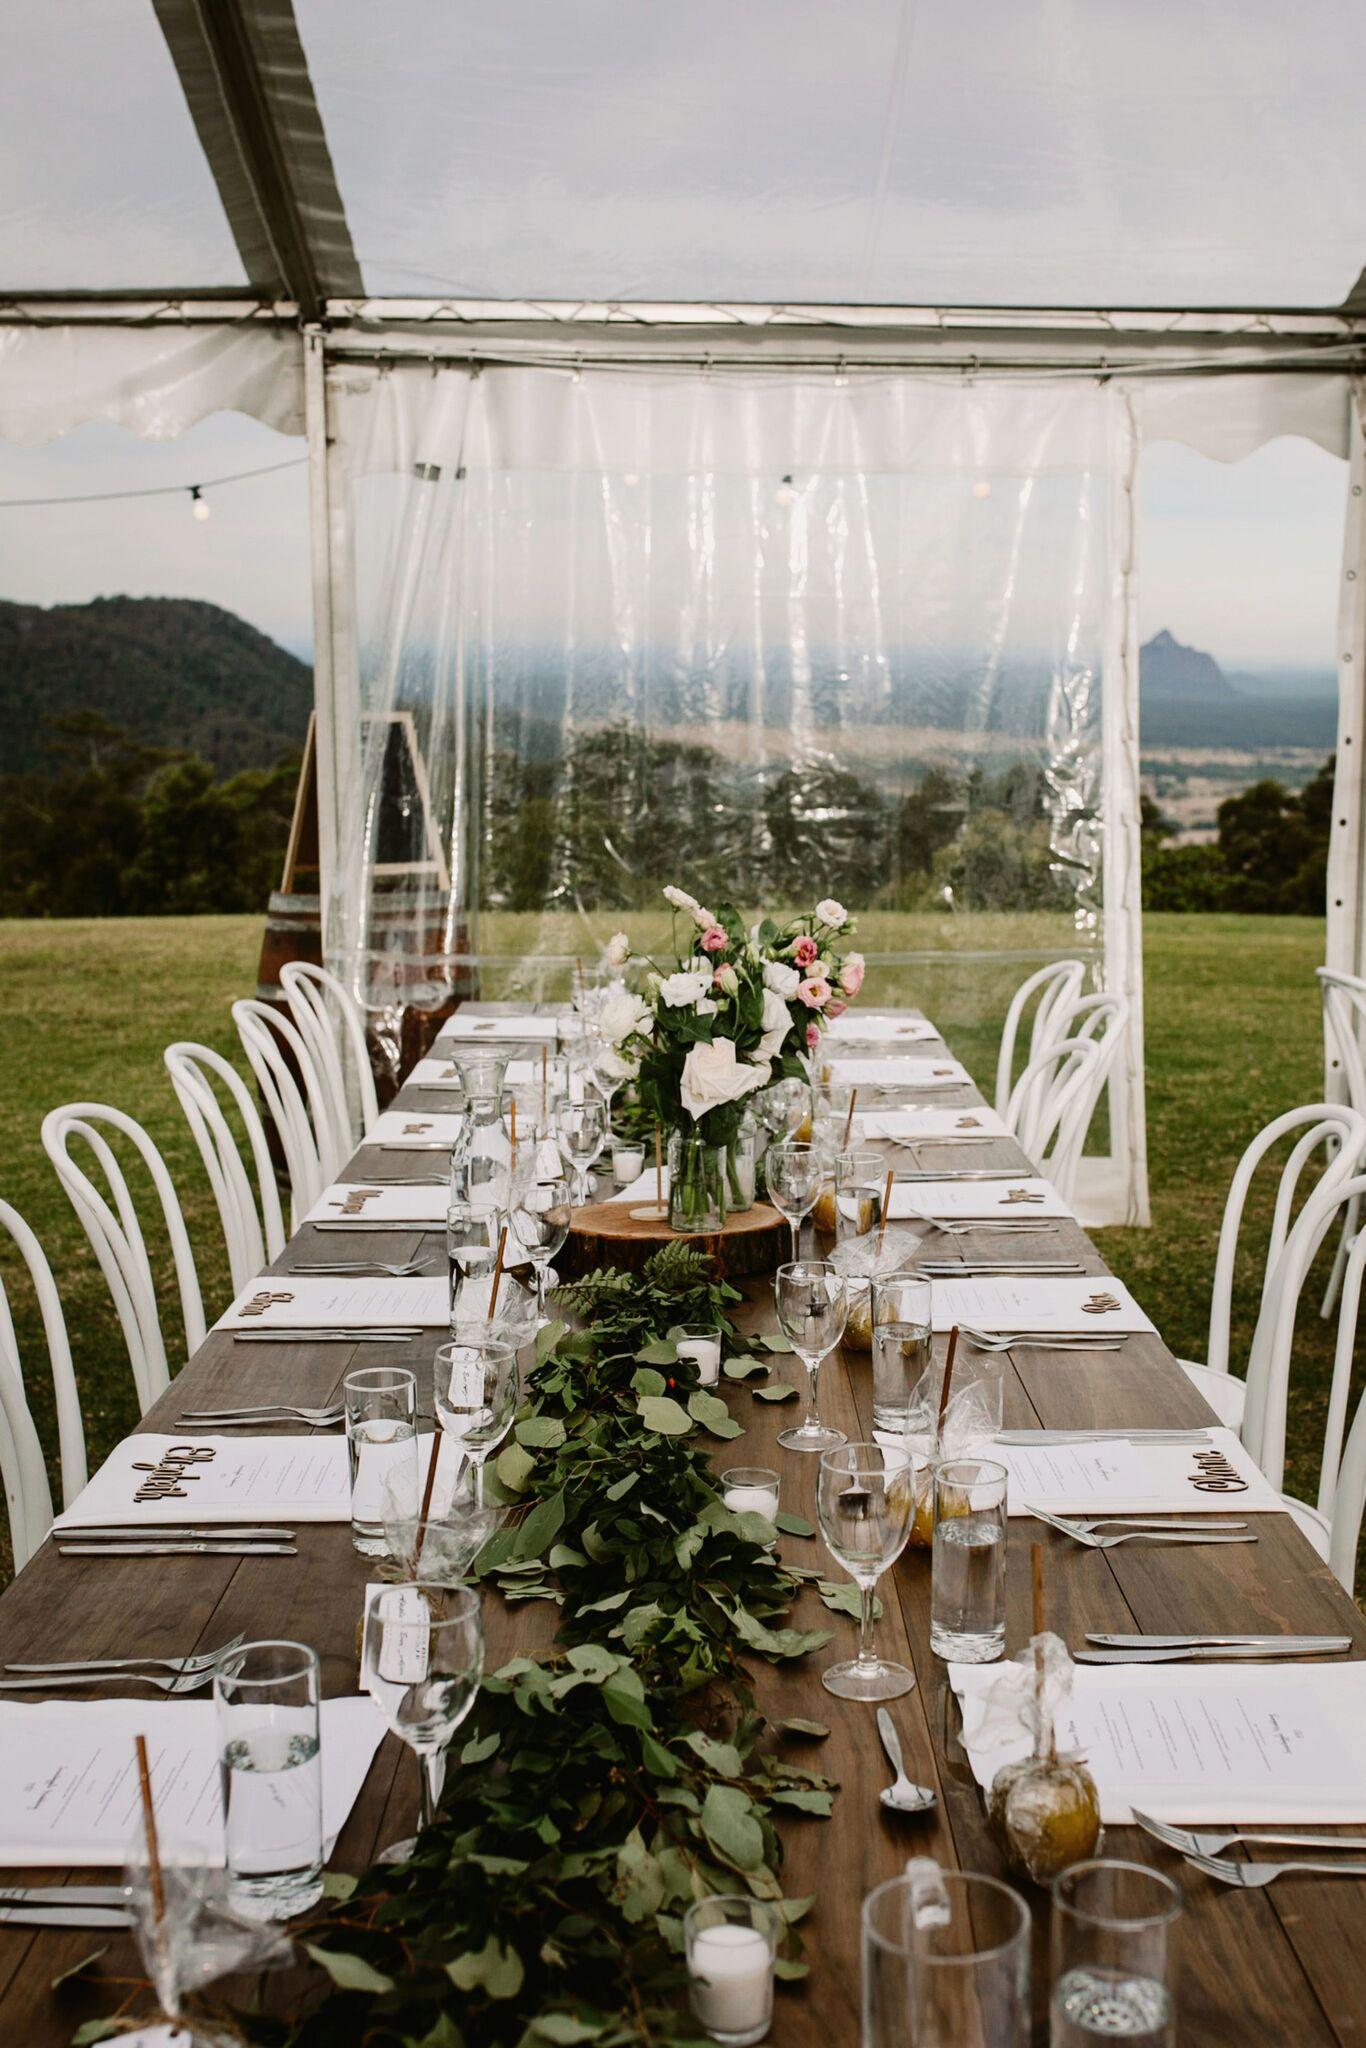 Natalie-Tim-Maleny-Retreat-Sunshine-Coast-Wedding8.jpeg